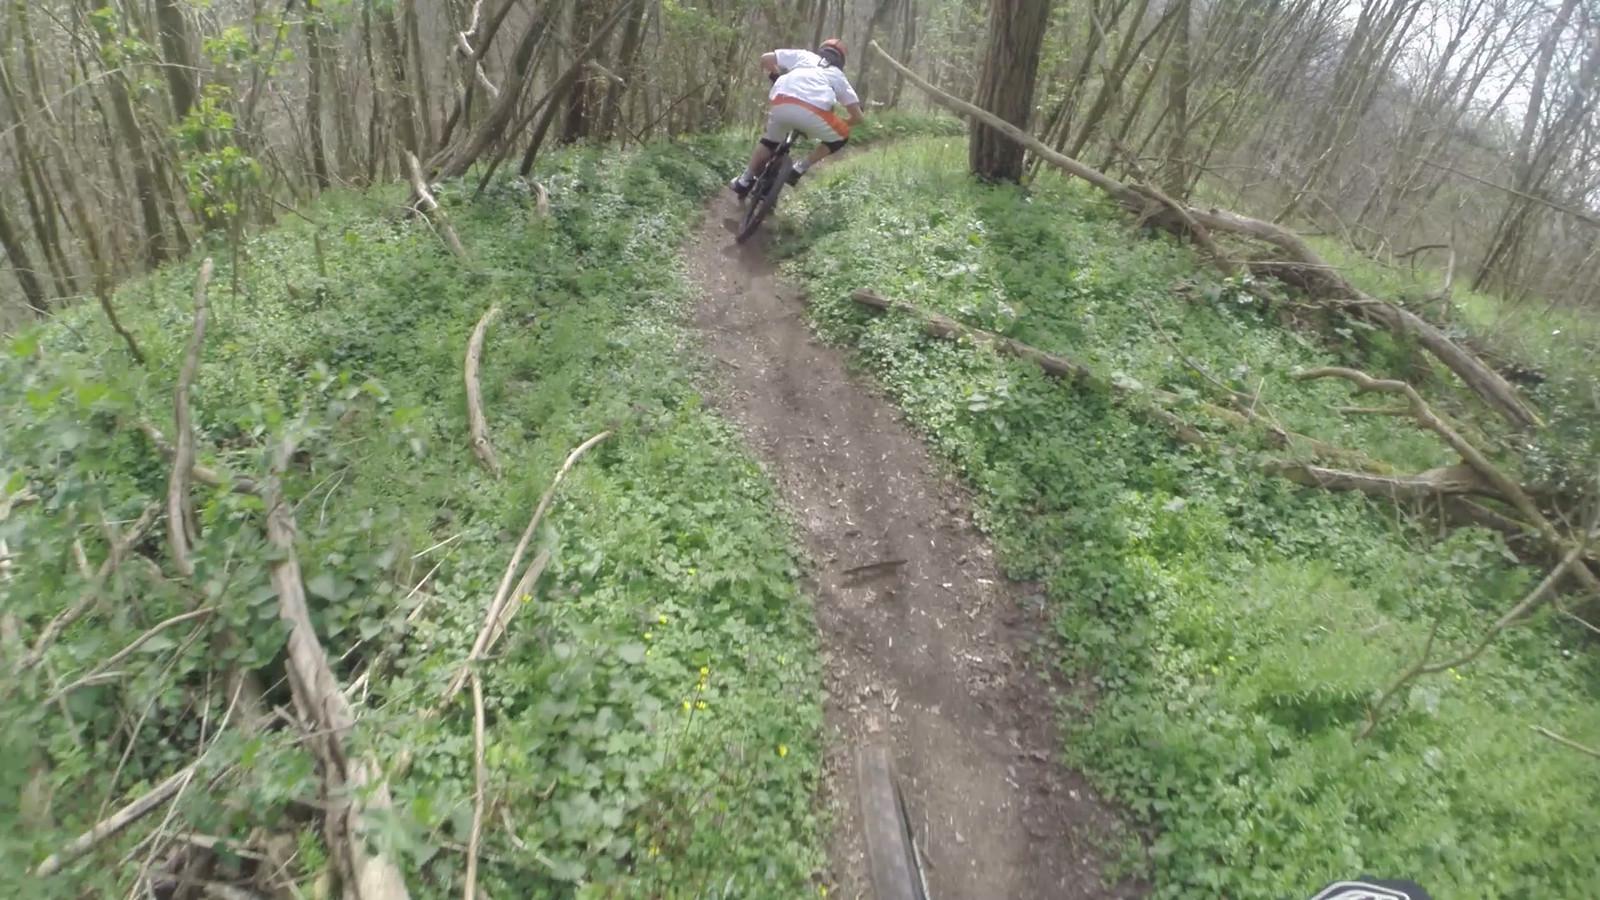 fr1 - dennis.leidelmeijer - Mountain Biking Pictures - Vital MTB